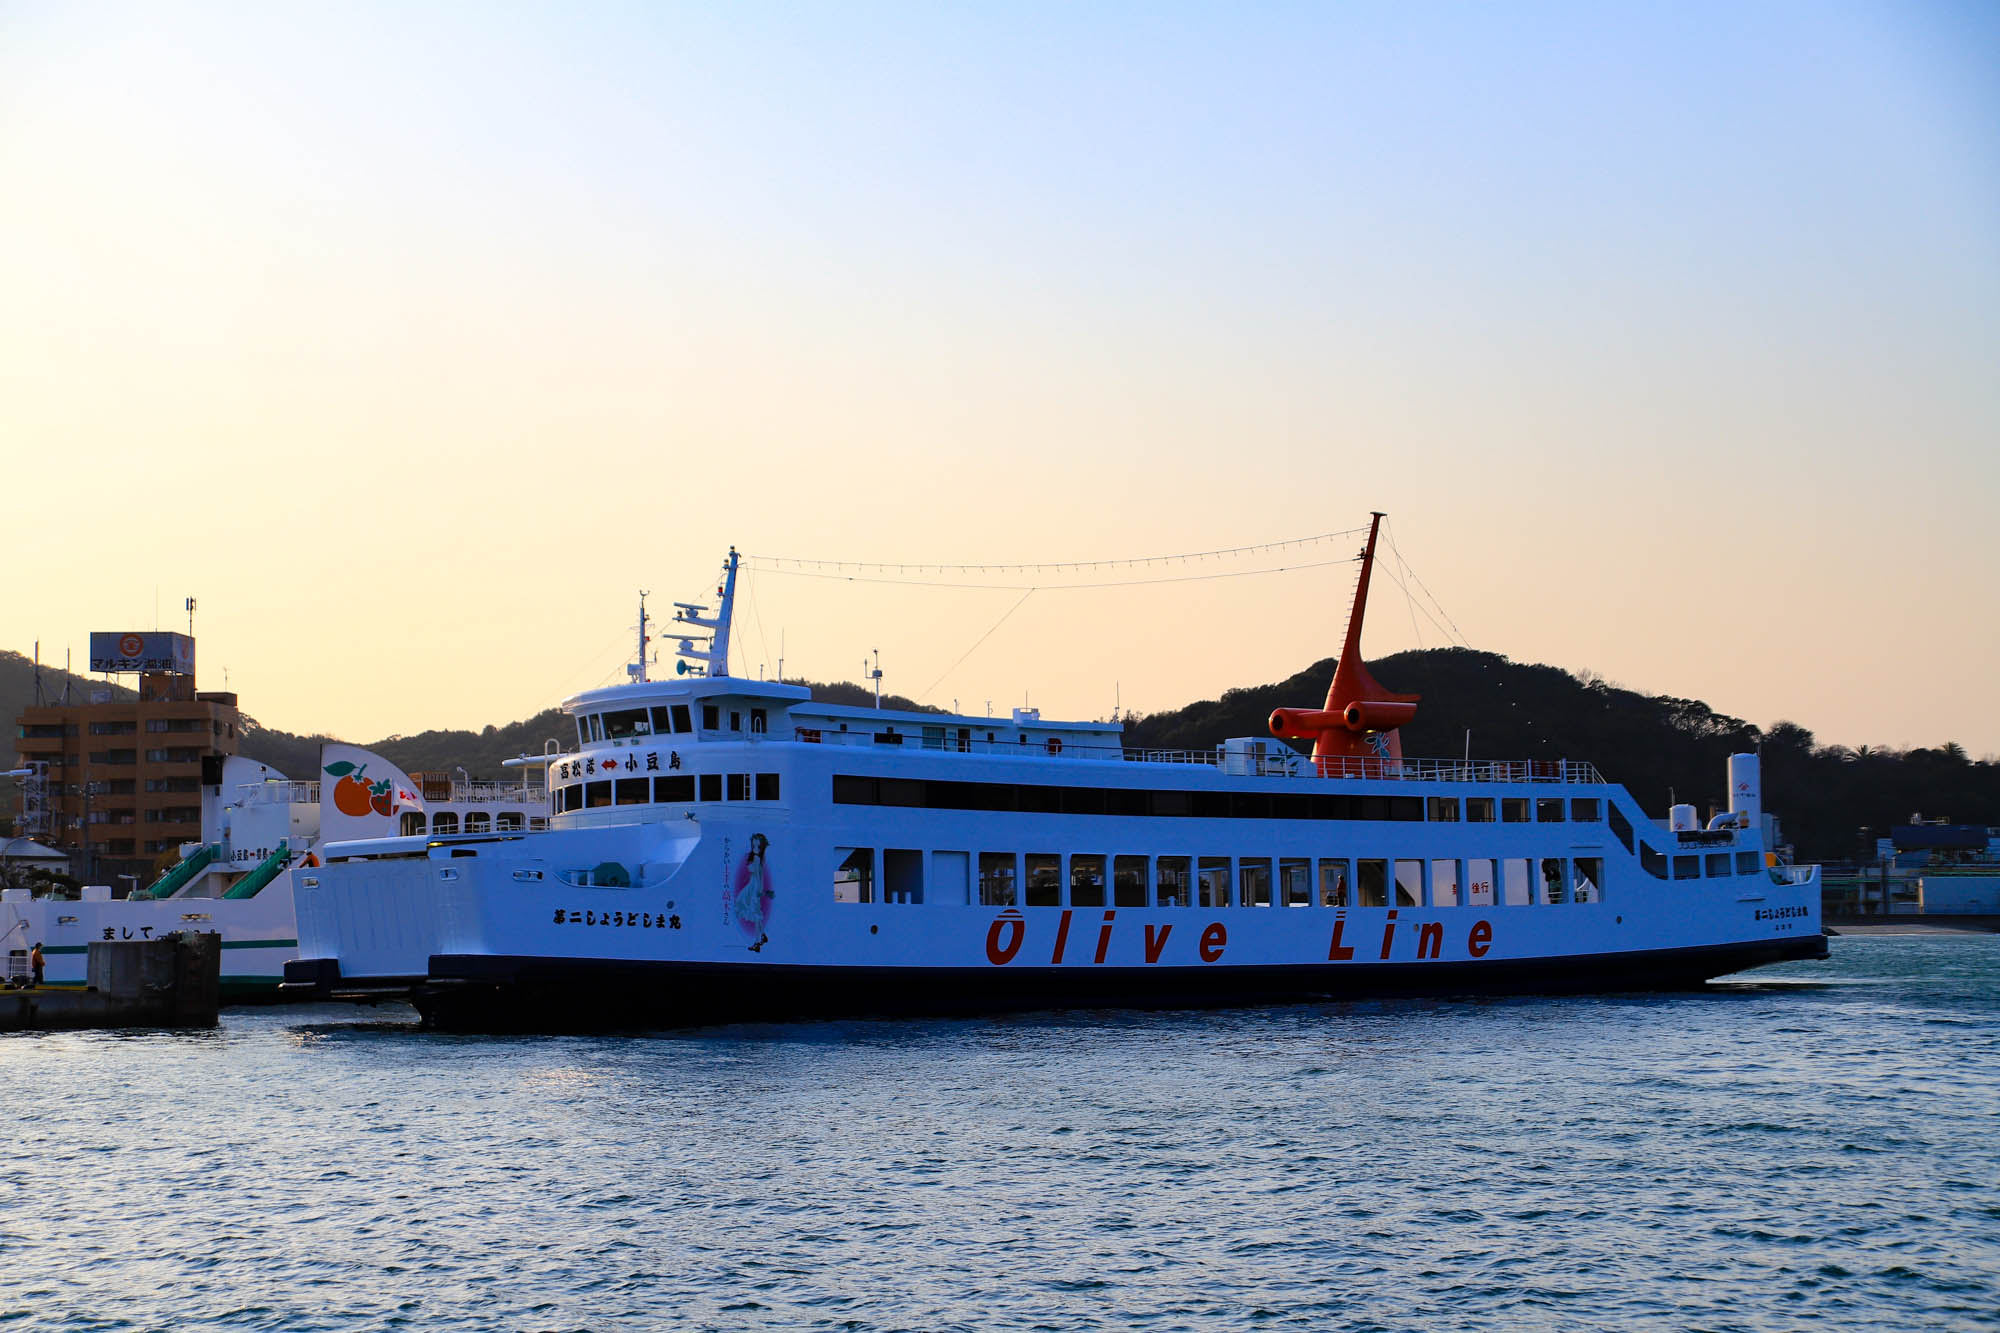 takagisan_ferry-6.jpg